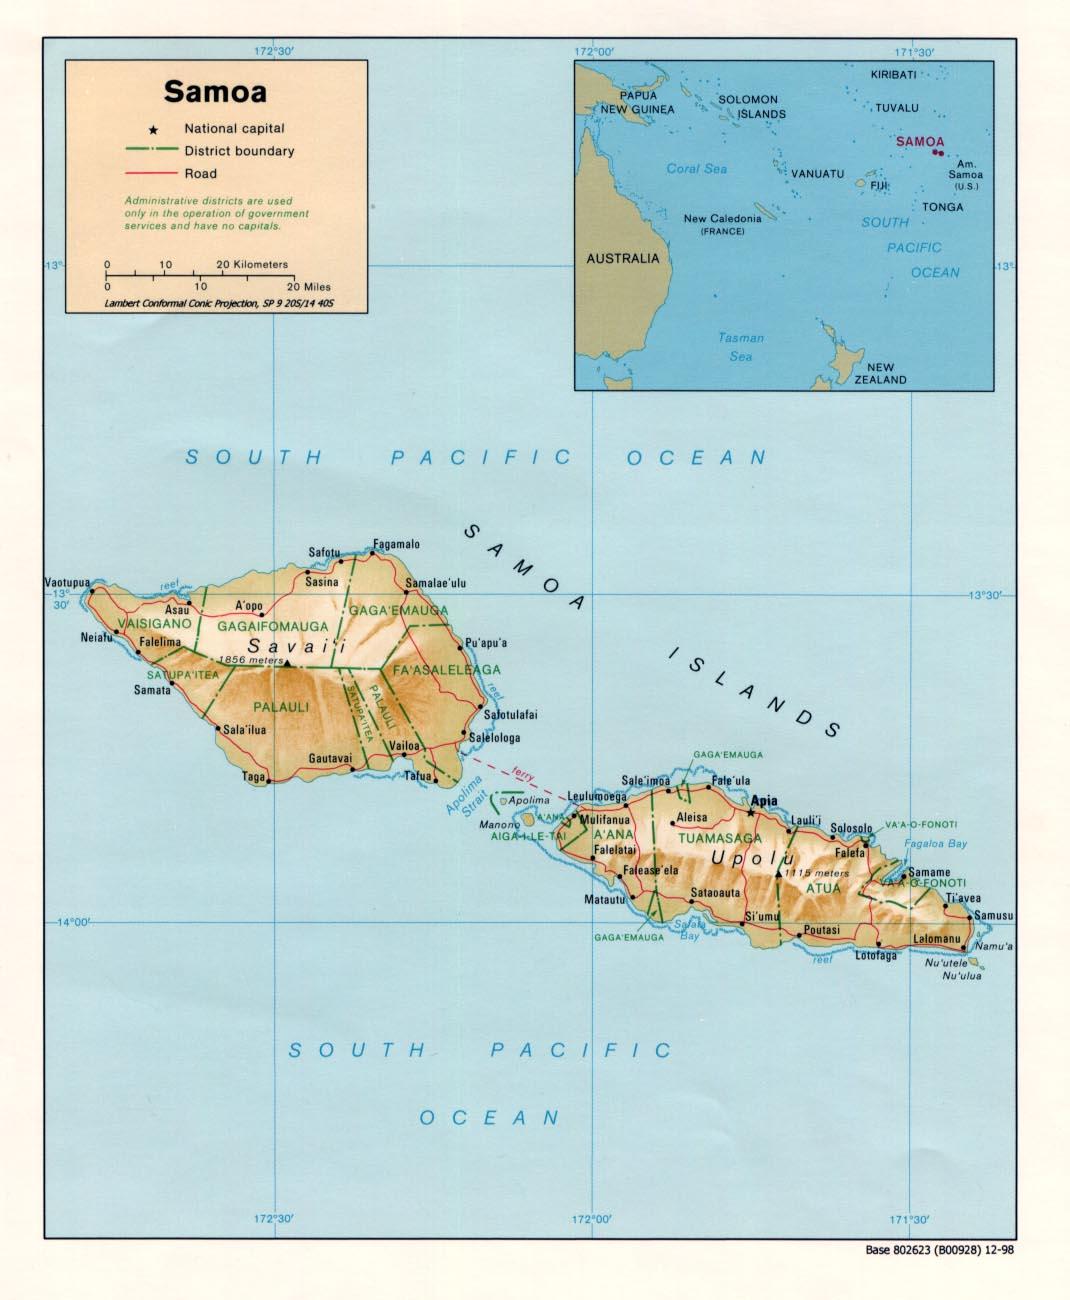 samoa maps